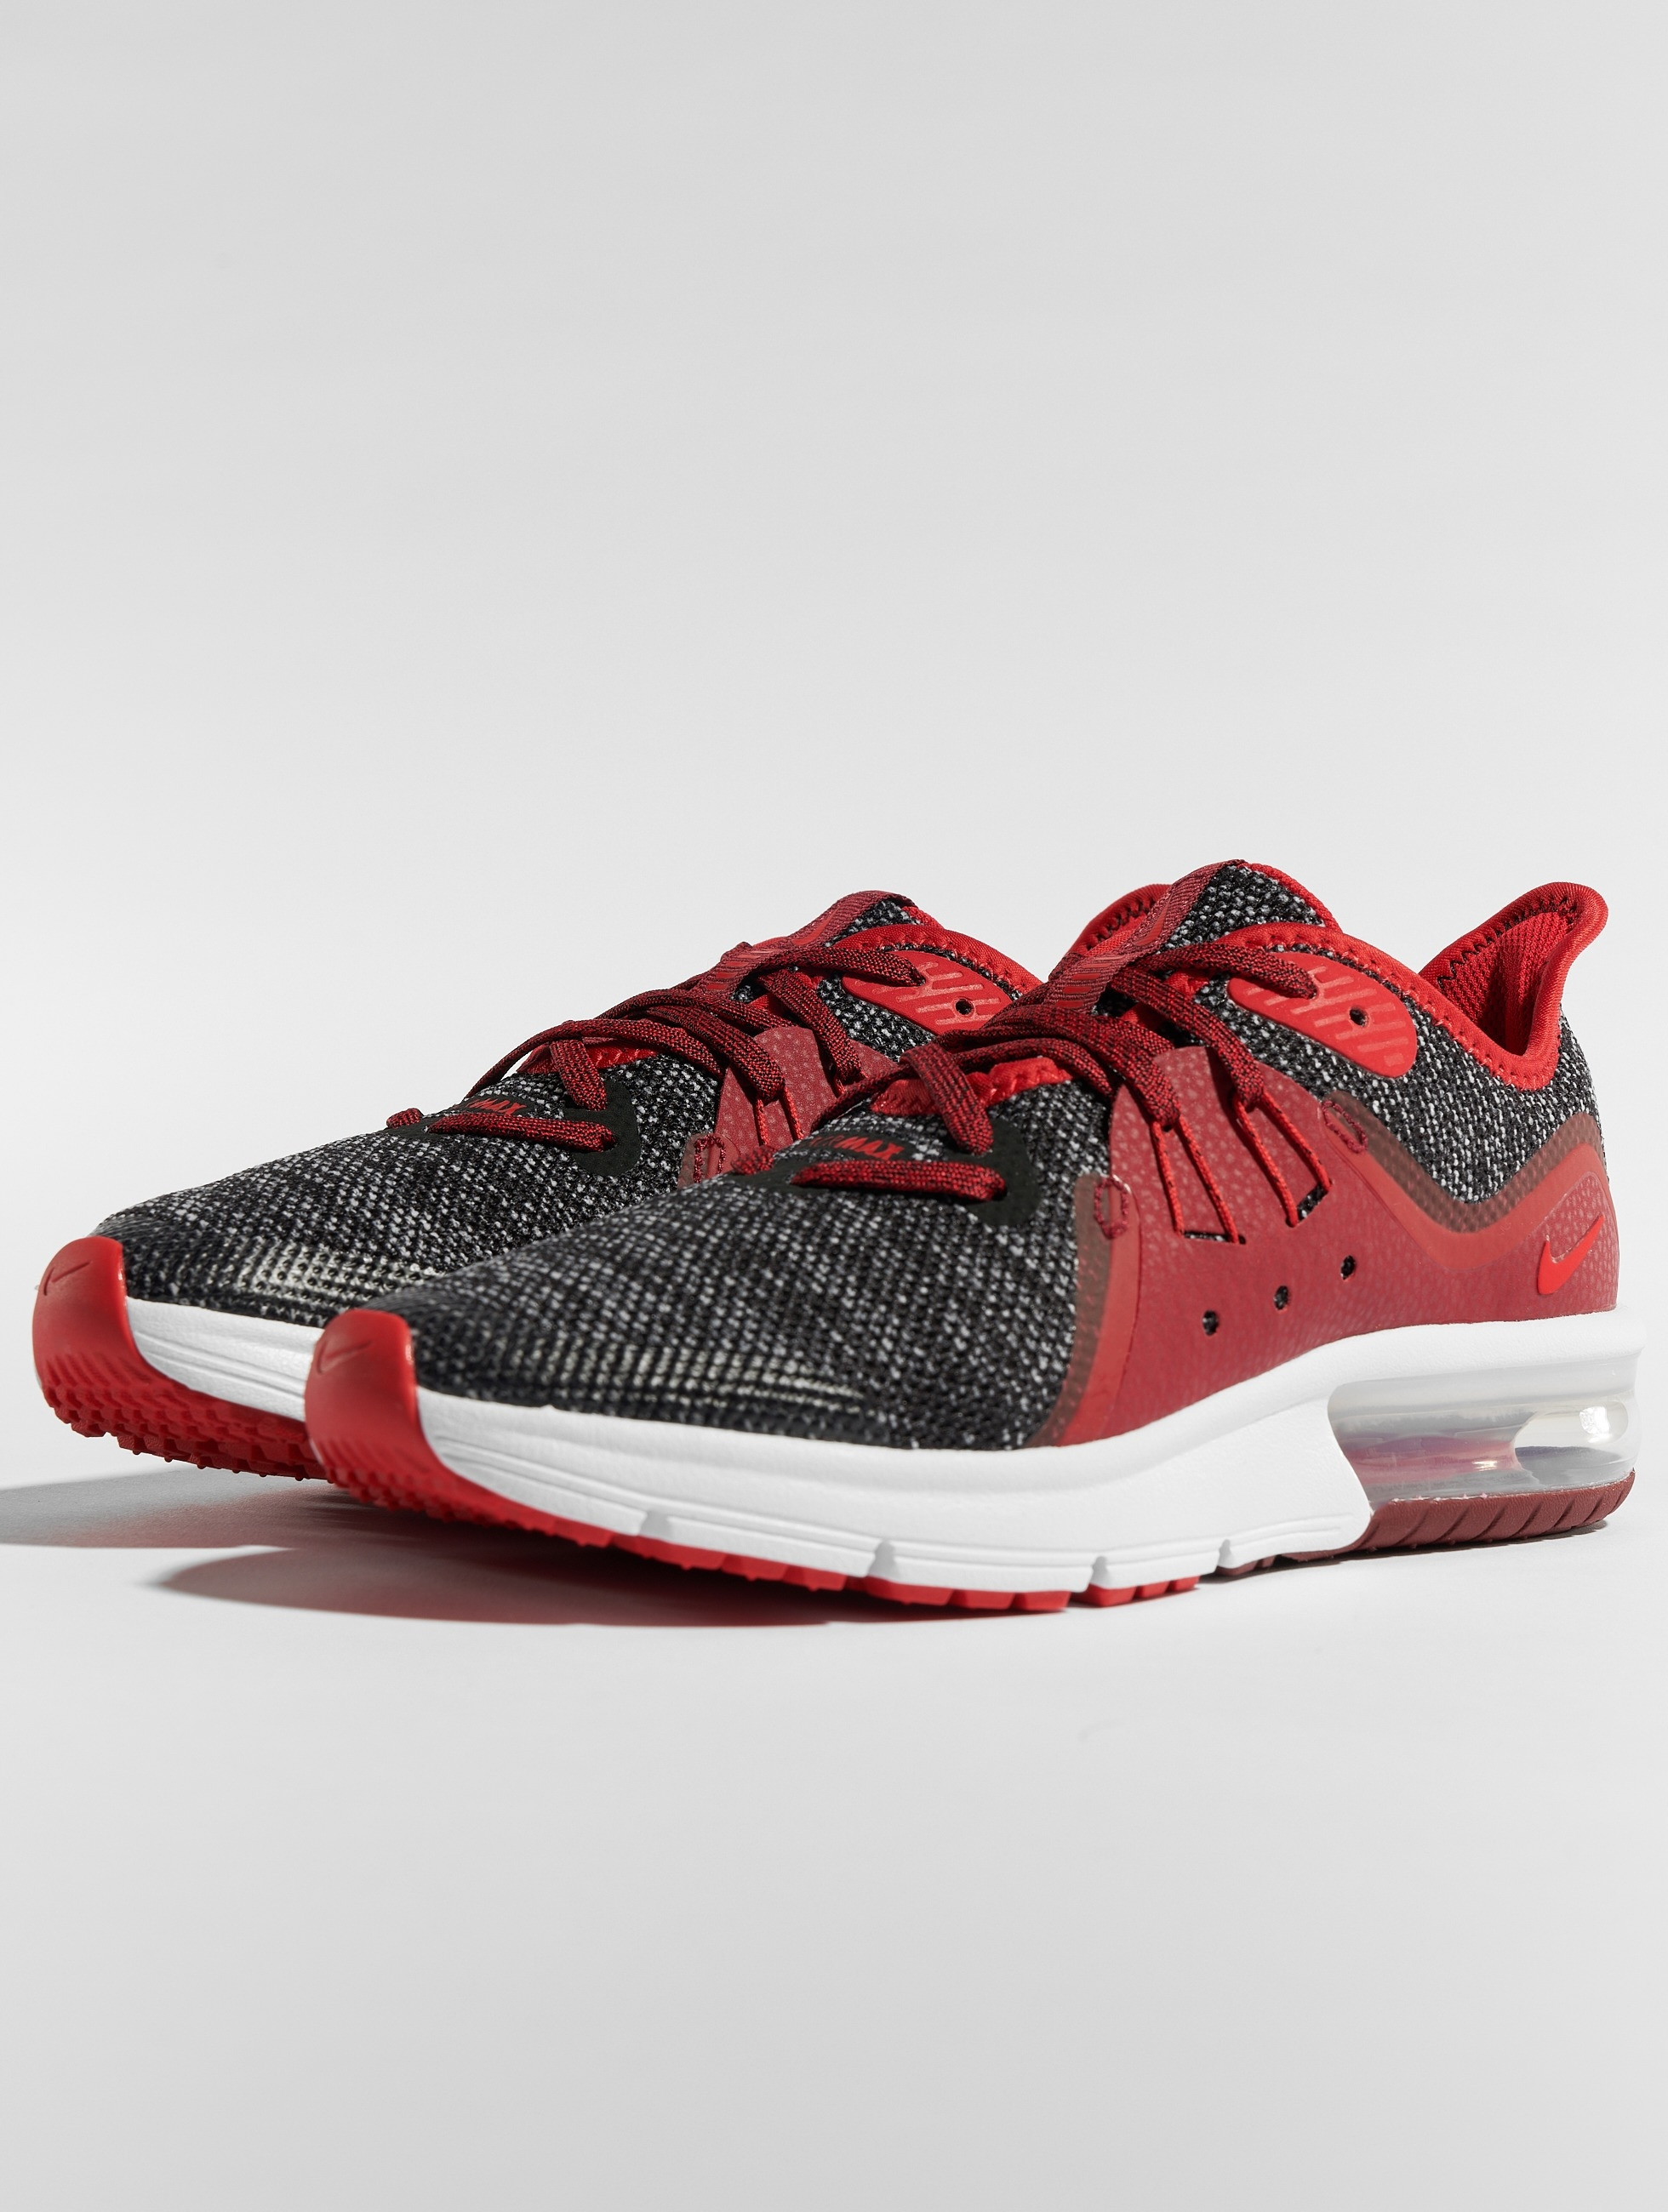 0a5a999ca2e Nike schoen / sneaker Air Max Sequent 3 in zwart 545161